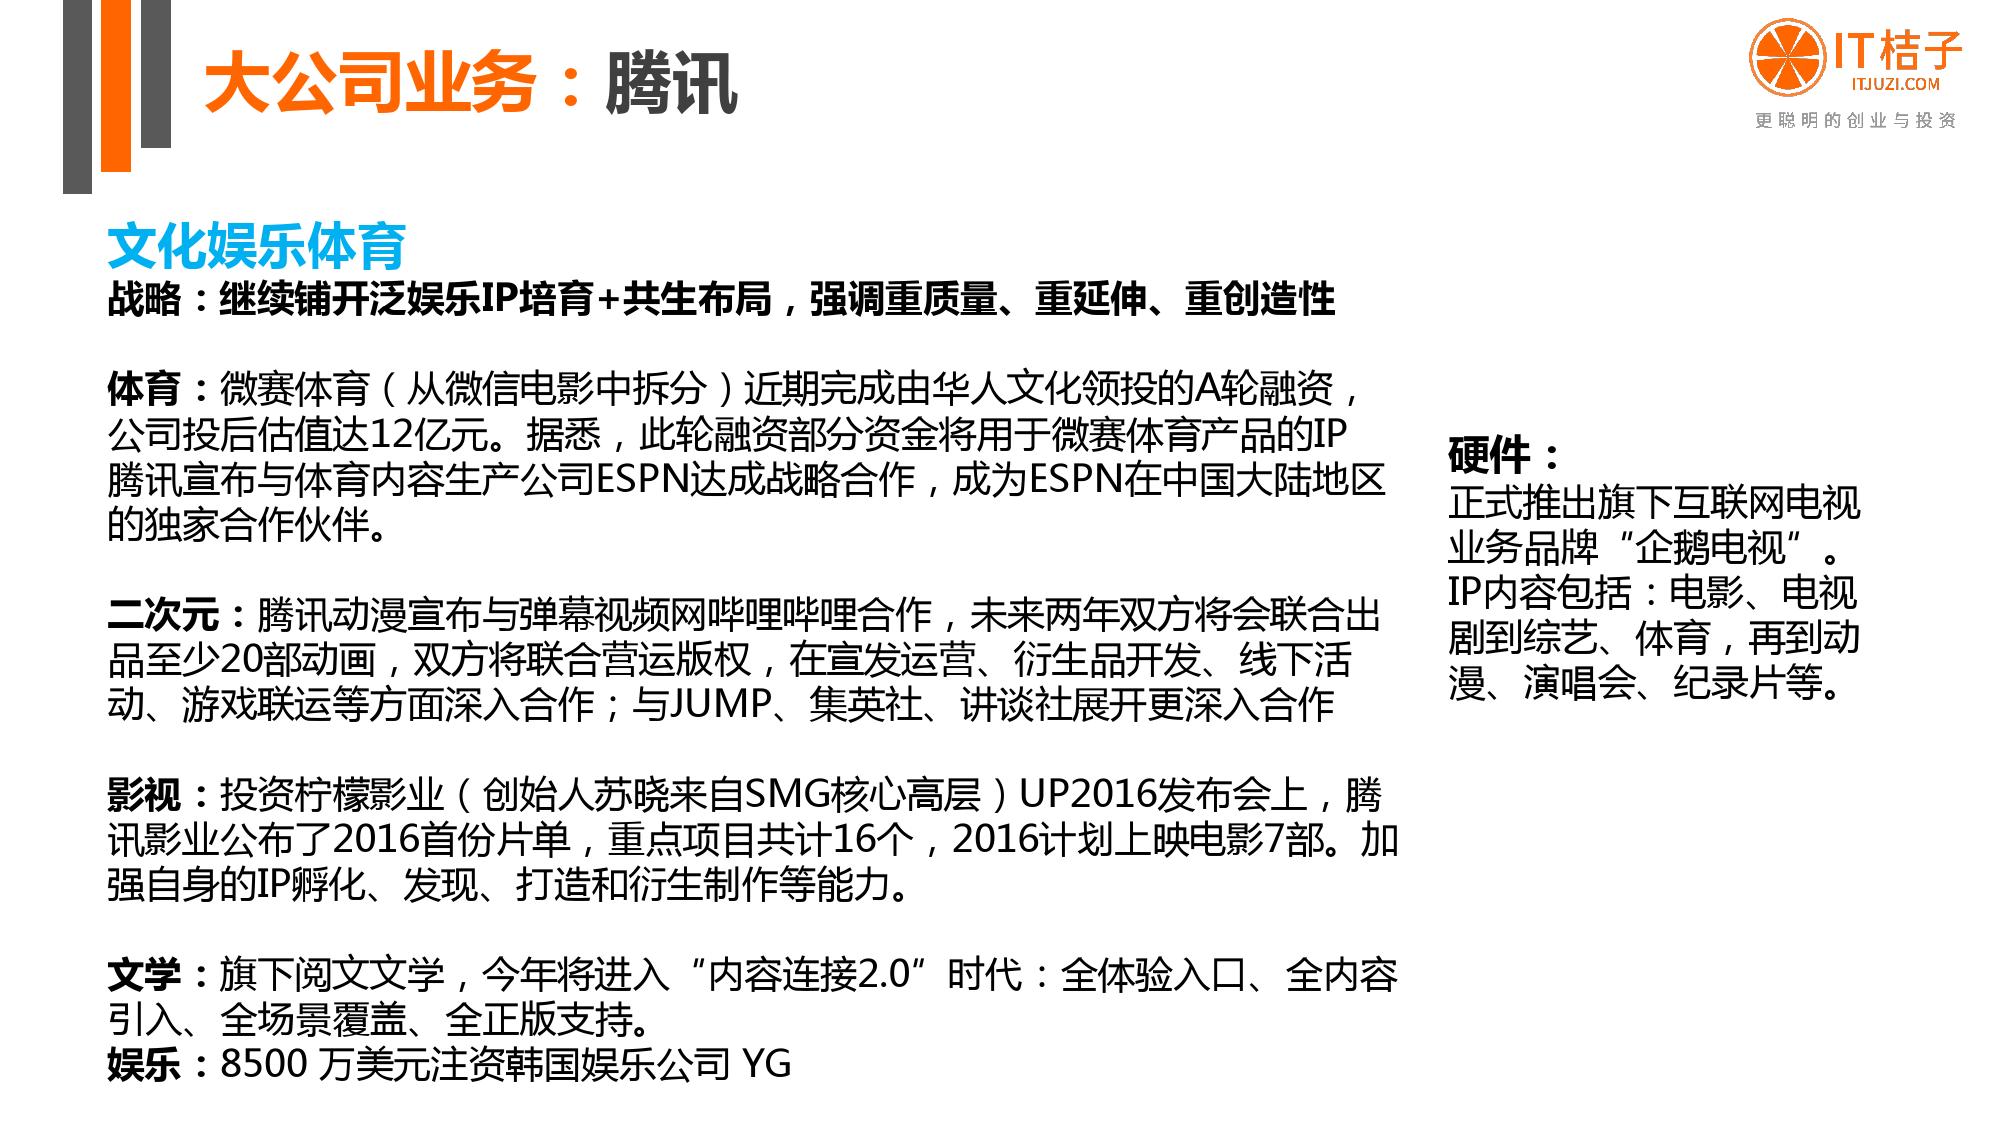 【IT桔子】2016年Q2中国互联网创业投资分析报告_000068